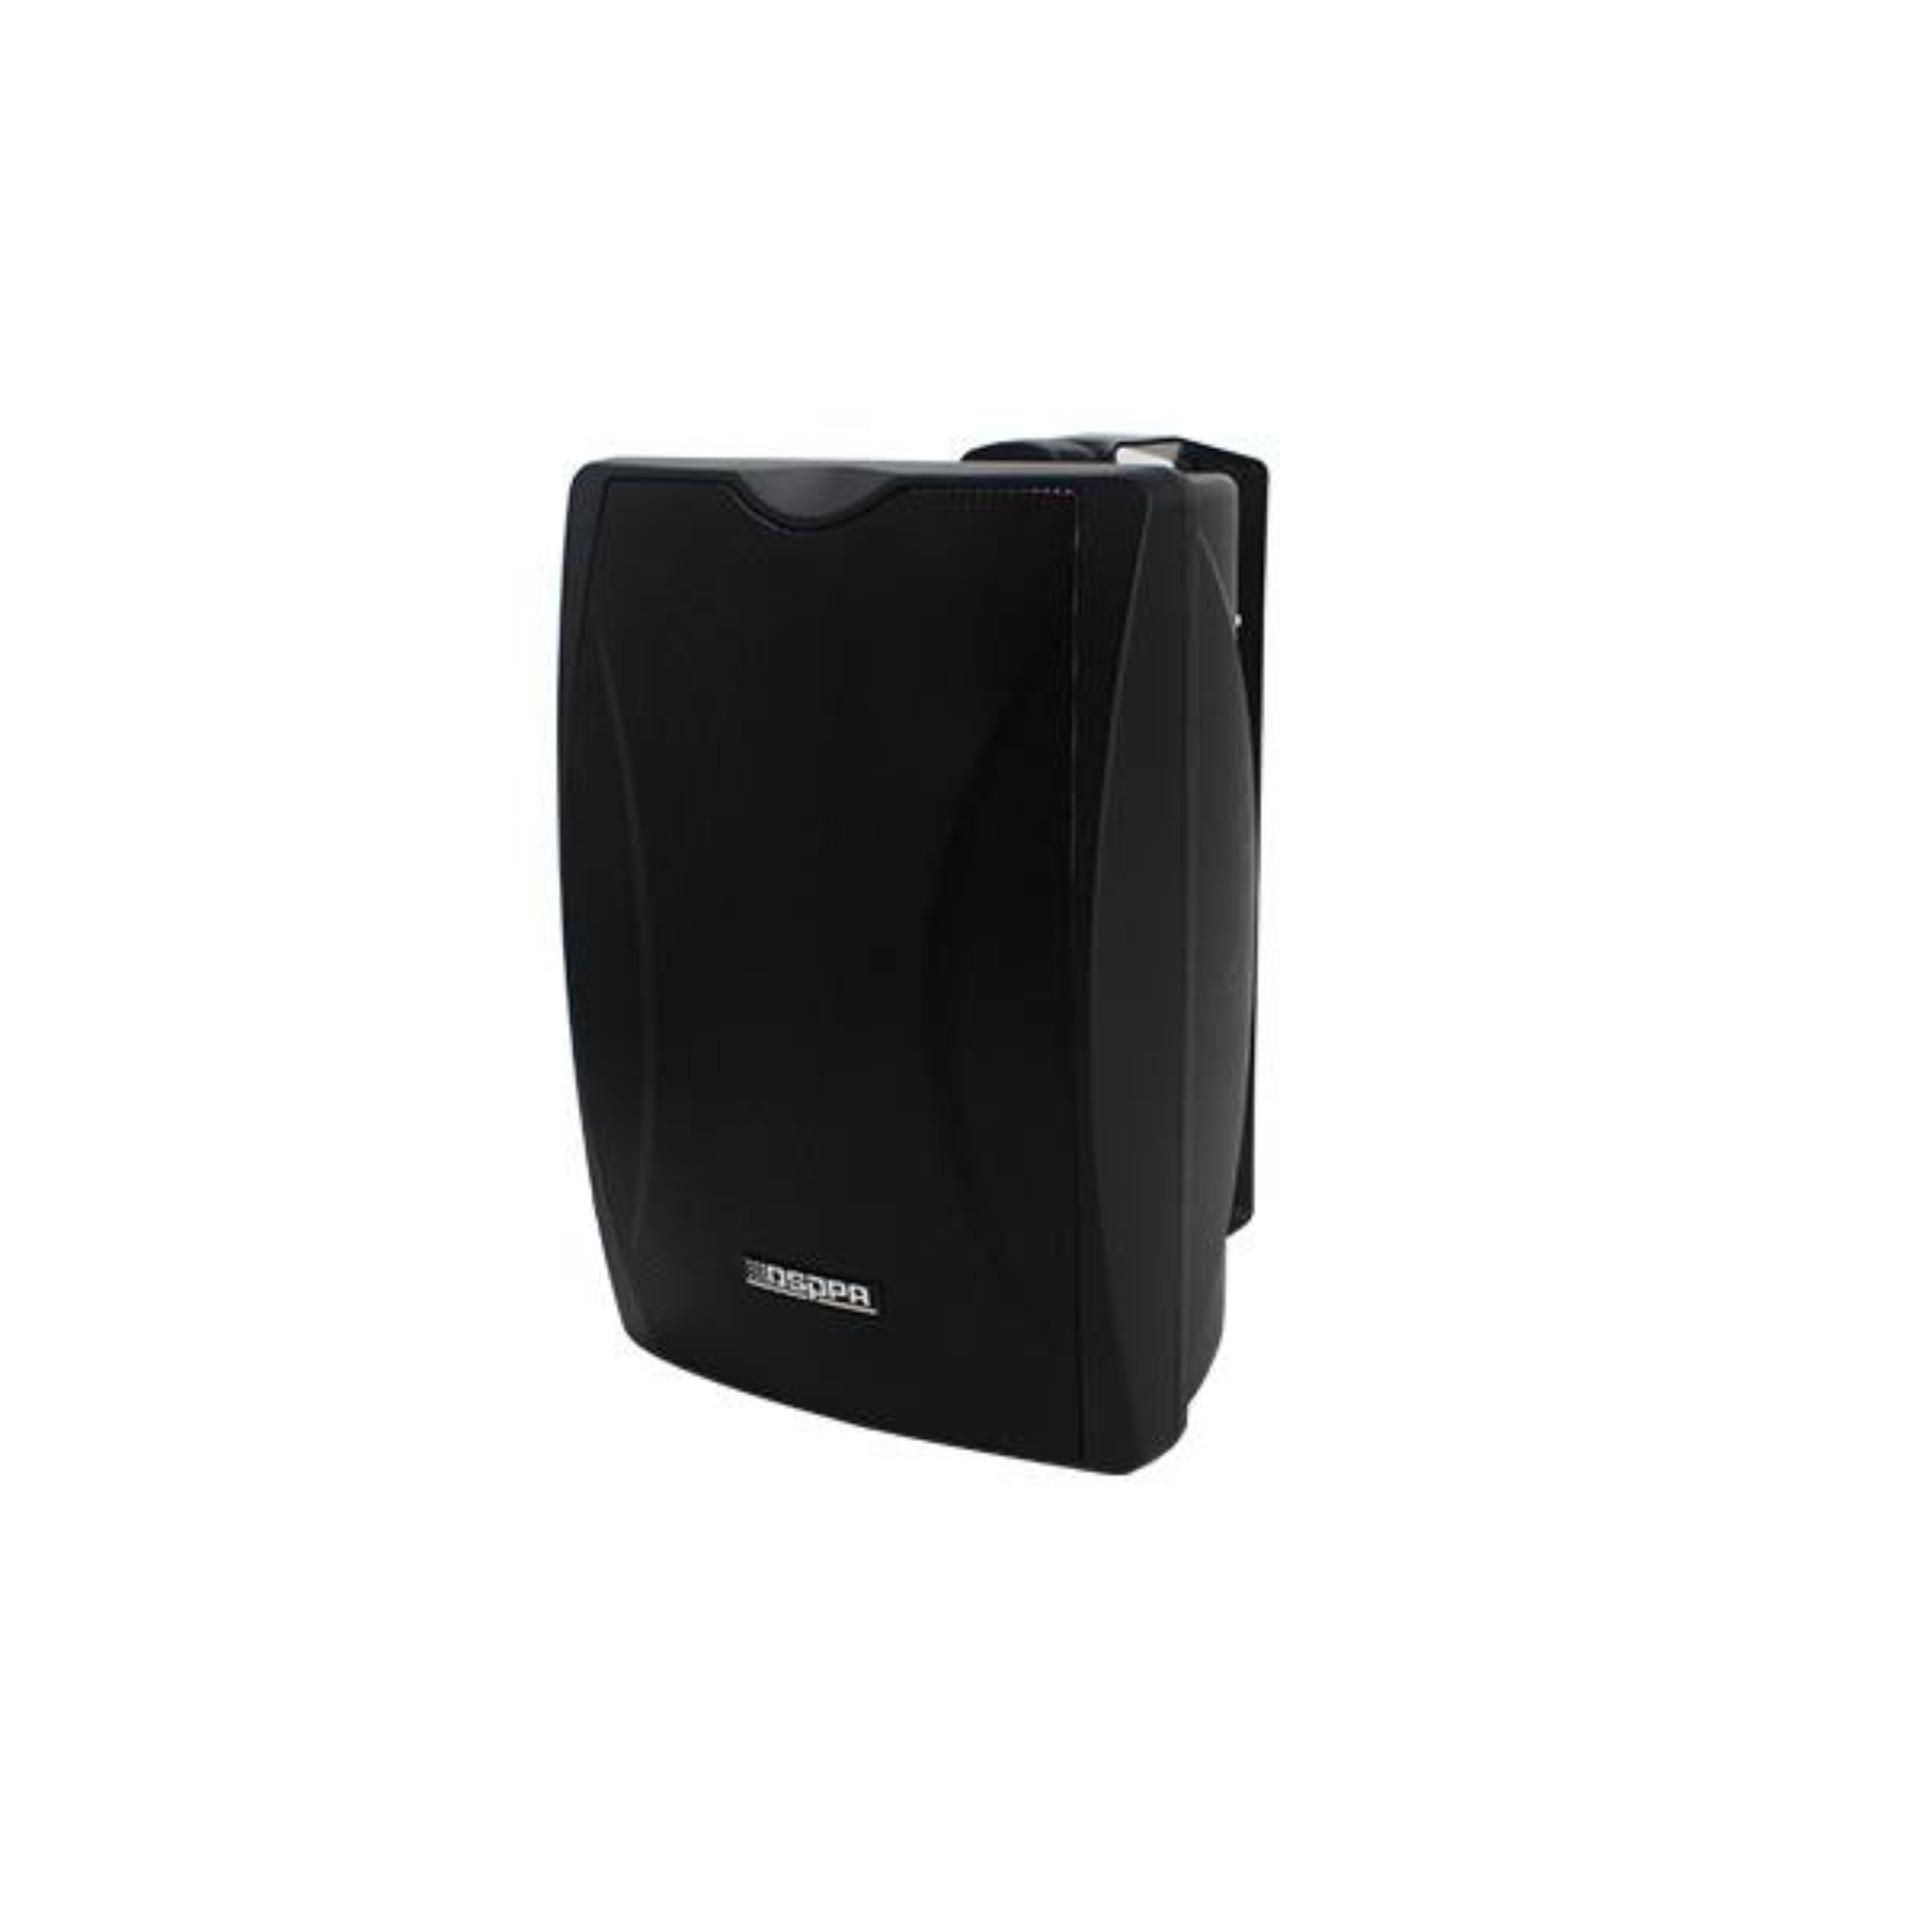 Loa iTeach Voice DSPPA DSP6606R